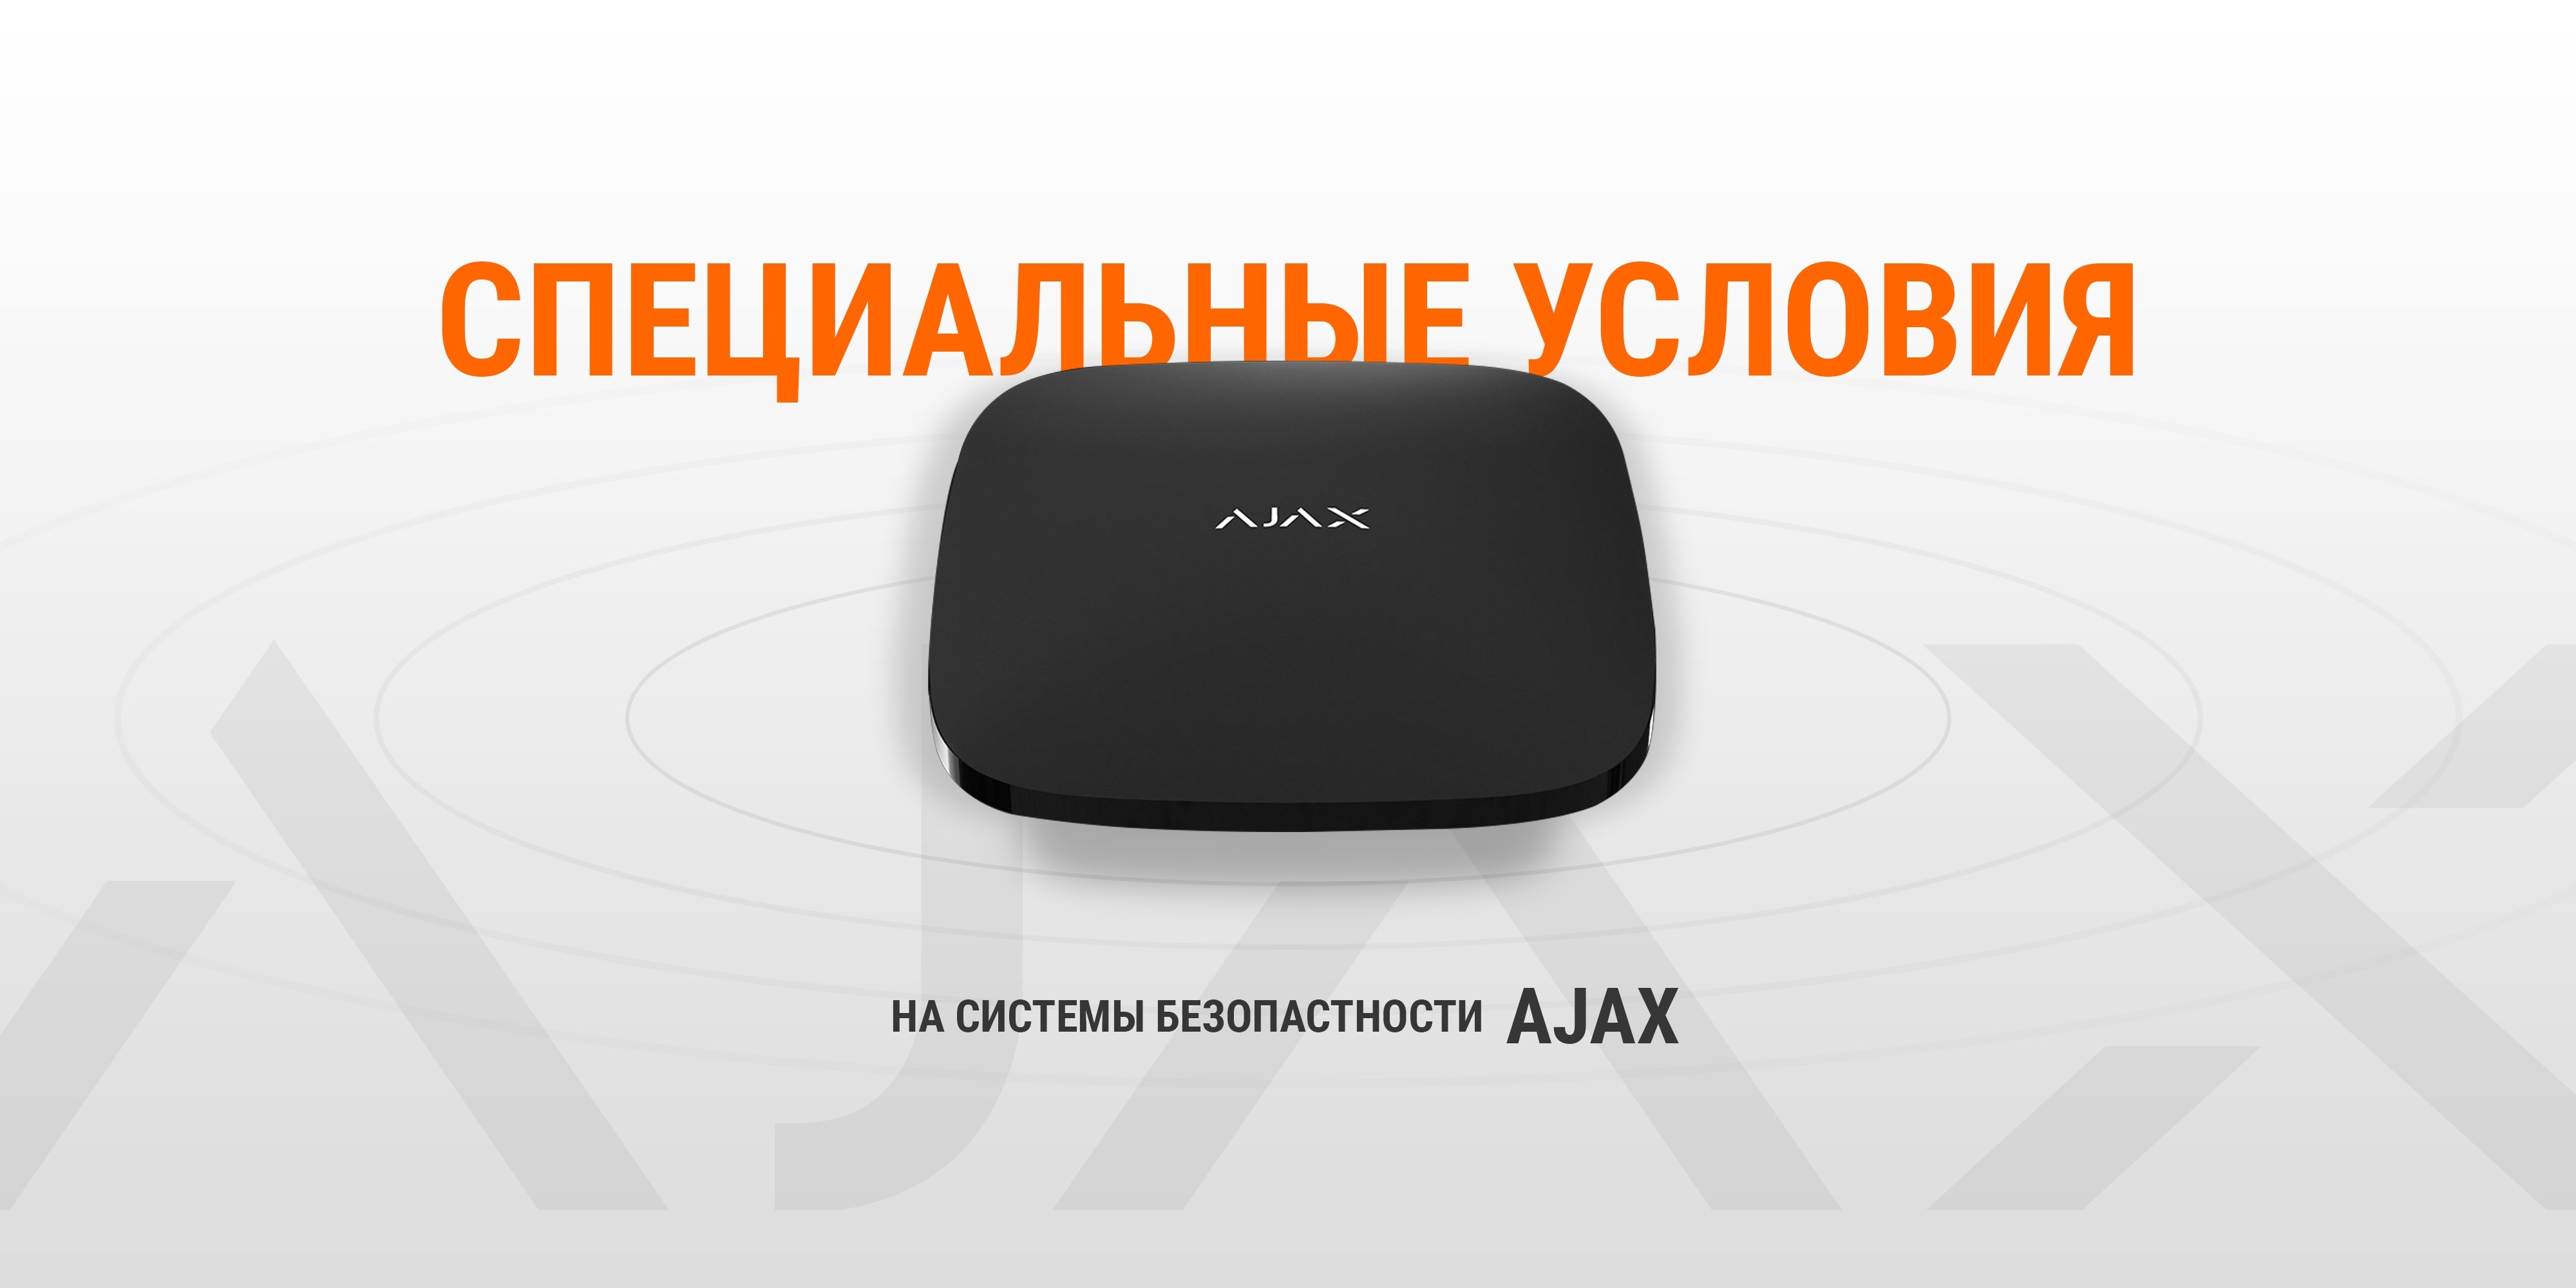 Standard One начинает сотрудничество с Ajax Systems